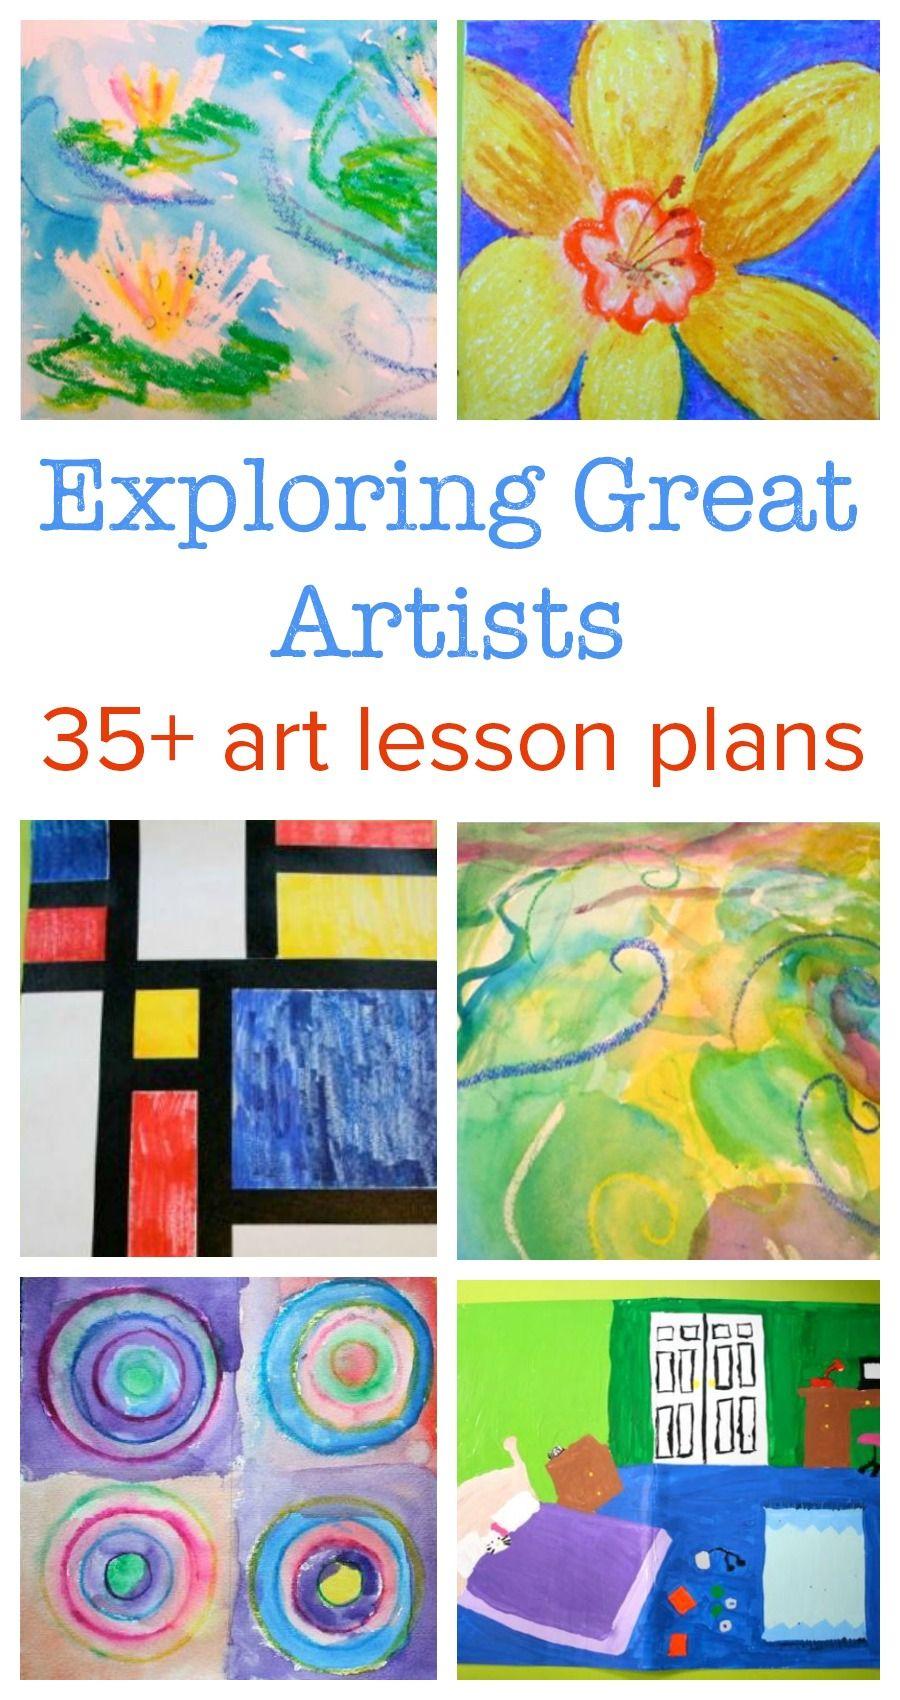 creative art lesson plans for preschoolers exploring great artists complete lesson plans 651